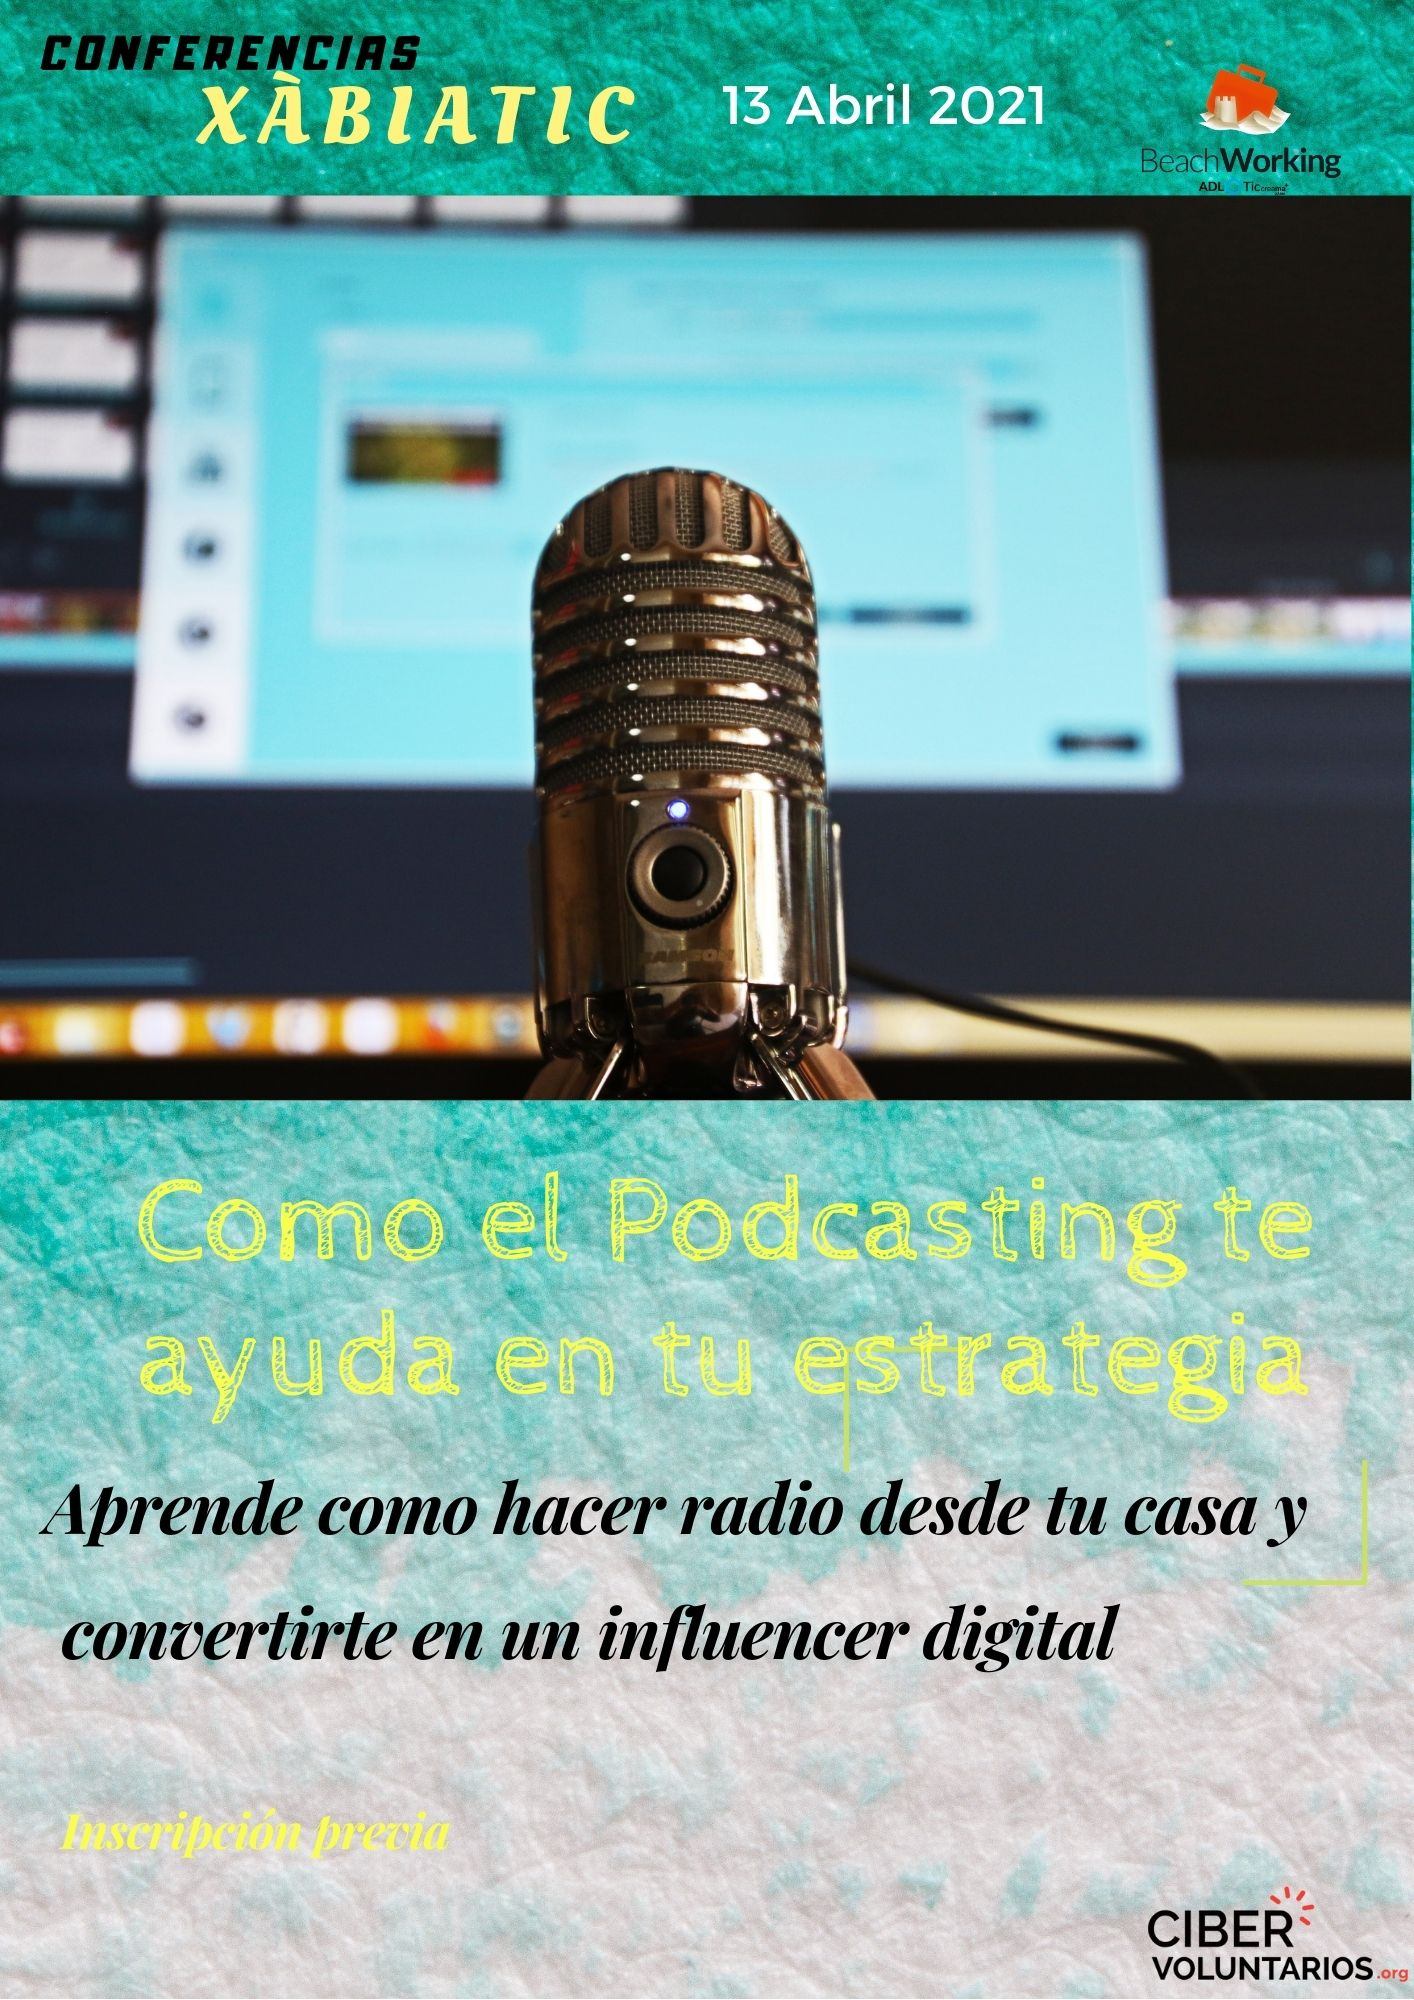 Taller de Podcasting Xàbia